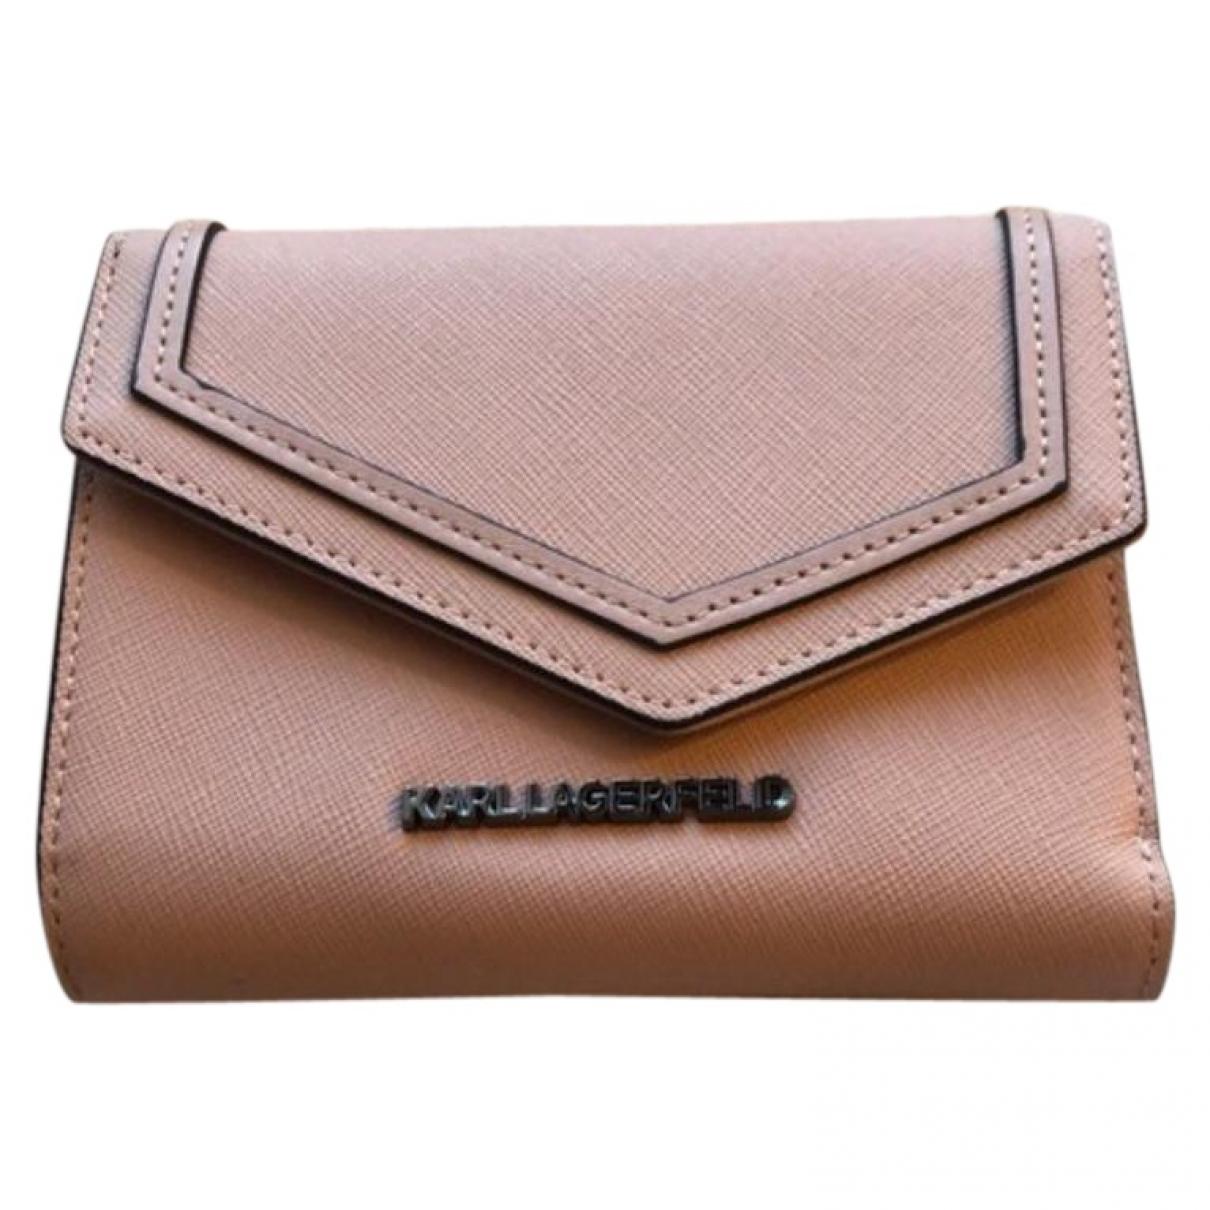 Karl Lagerfeld \N Pink Leather wallet for Women \N